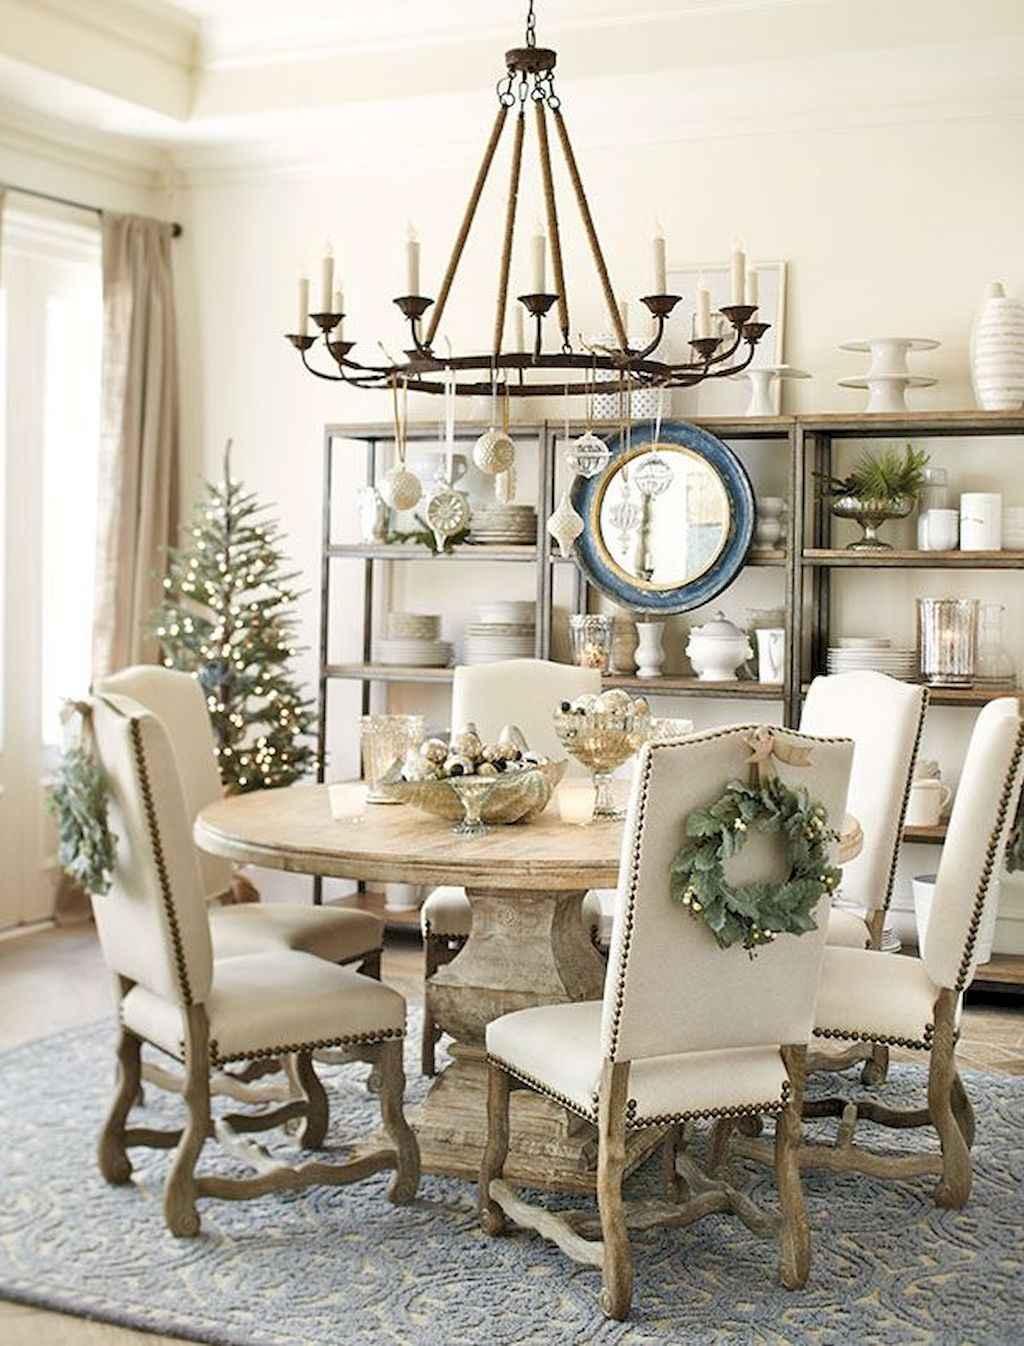 100 Rustic Farmhouse Dining Room Decor Ideas (27)